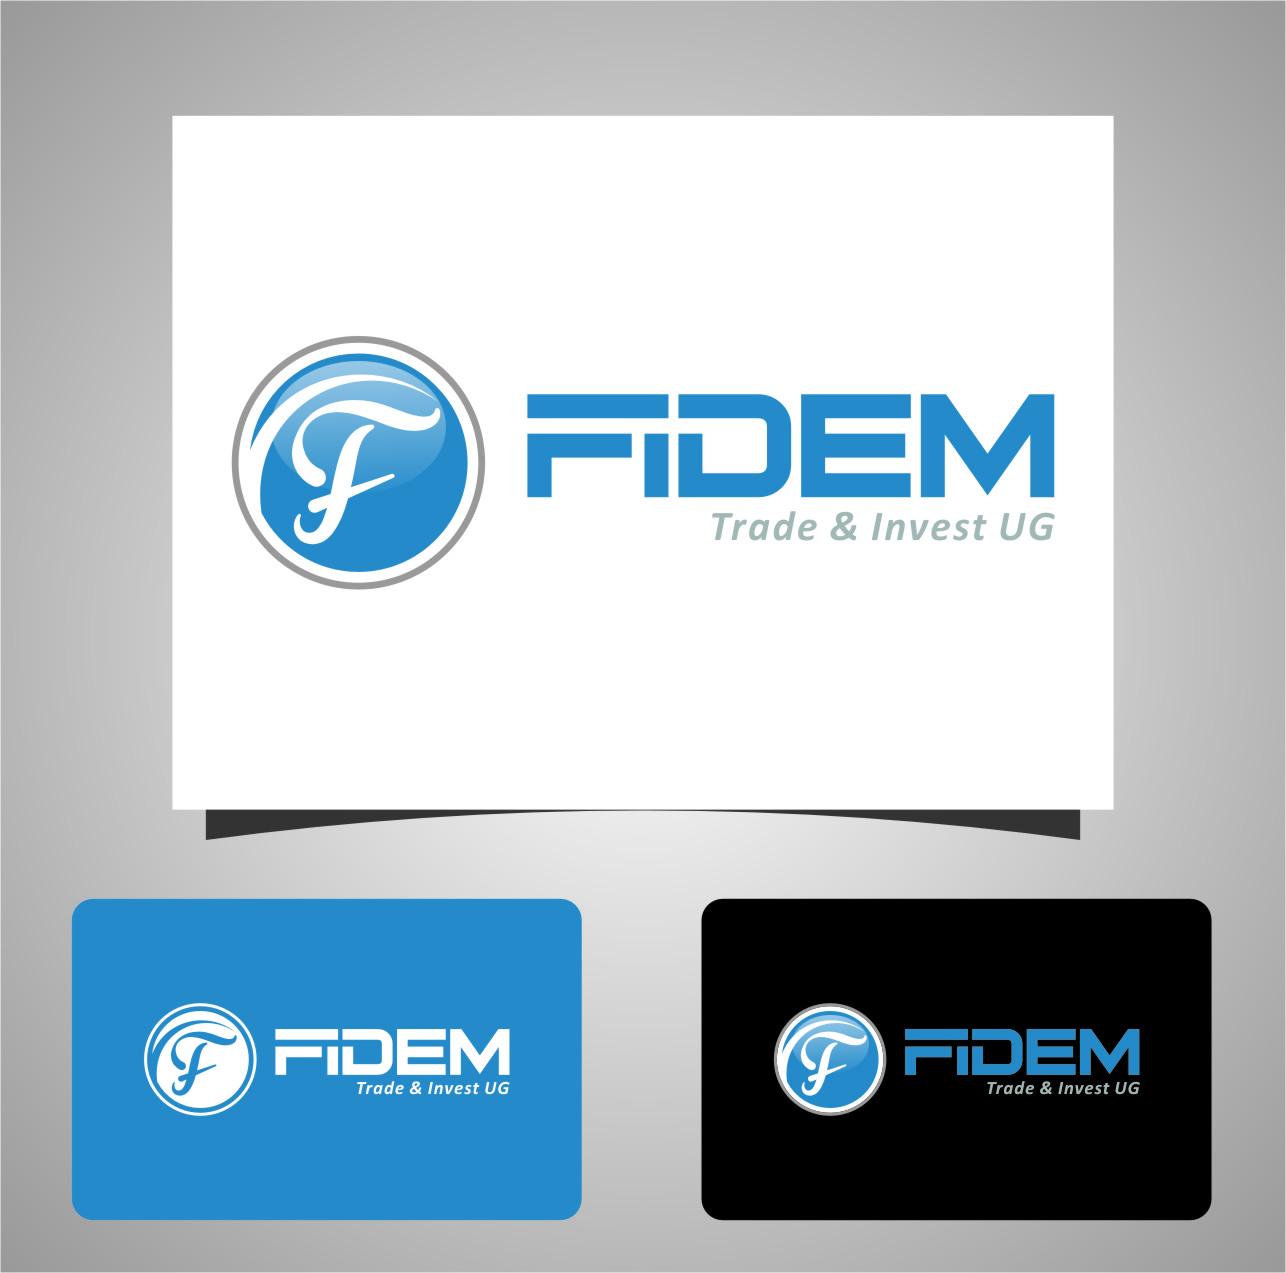 Logo Design by Ngepet_art - Entry No. 730 in the Logo Design Contest Professional Logo Design for FIDEM Trade & Invest UG.